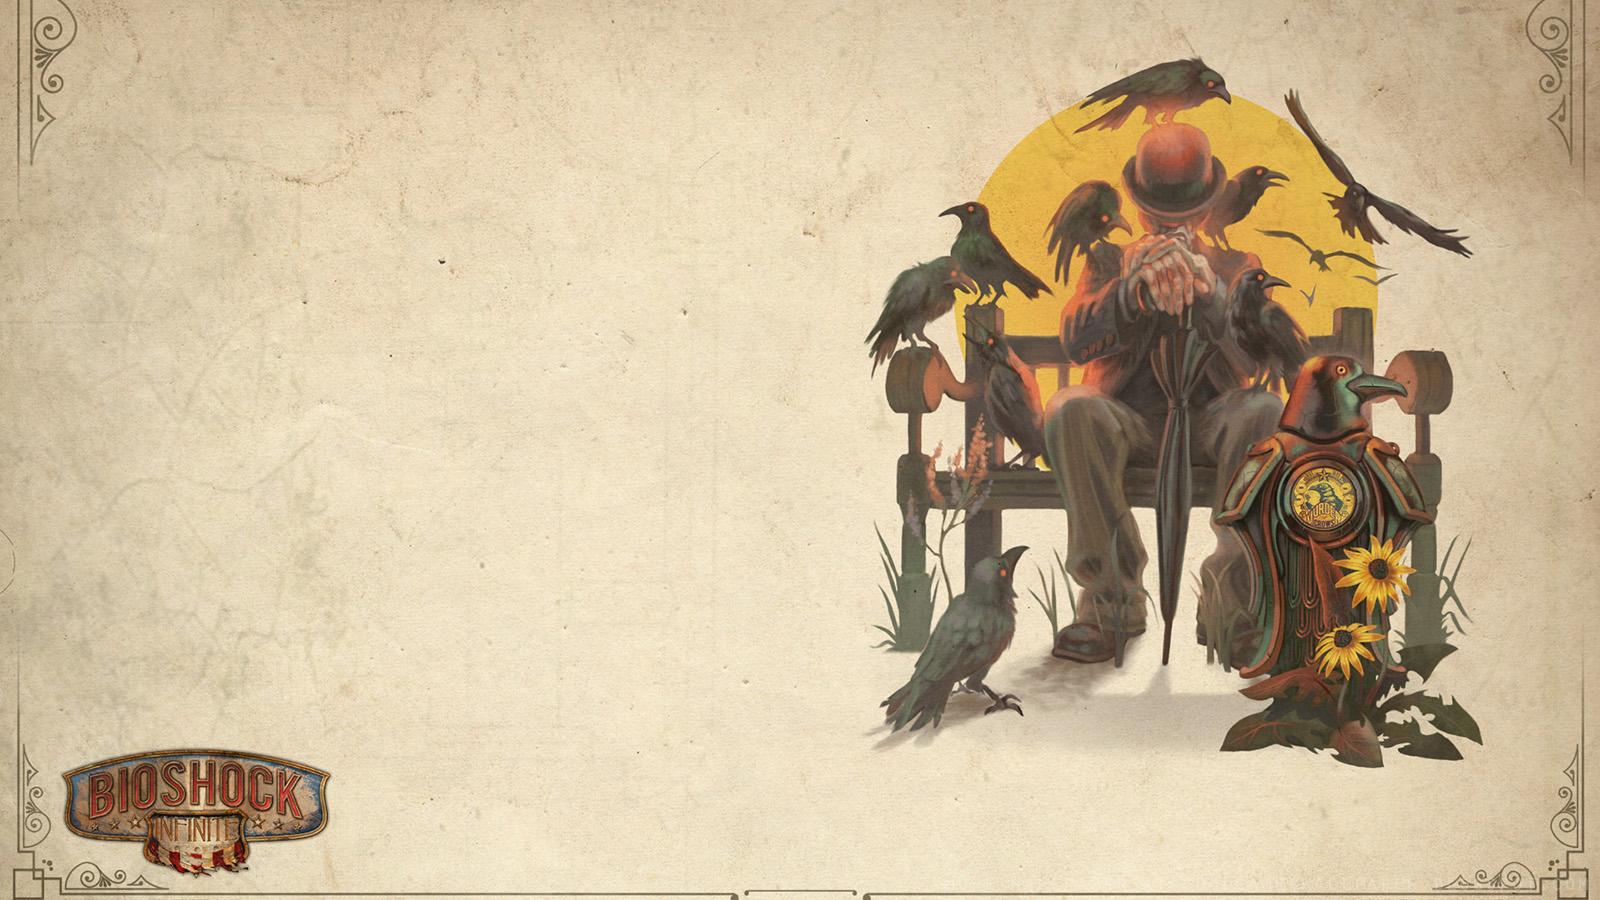 bioshock infinite screenshots wallpaper cool games wallpaper